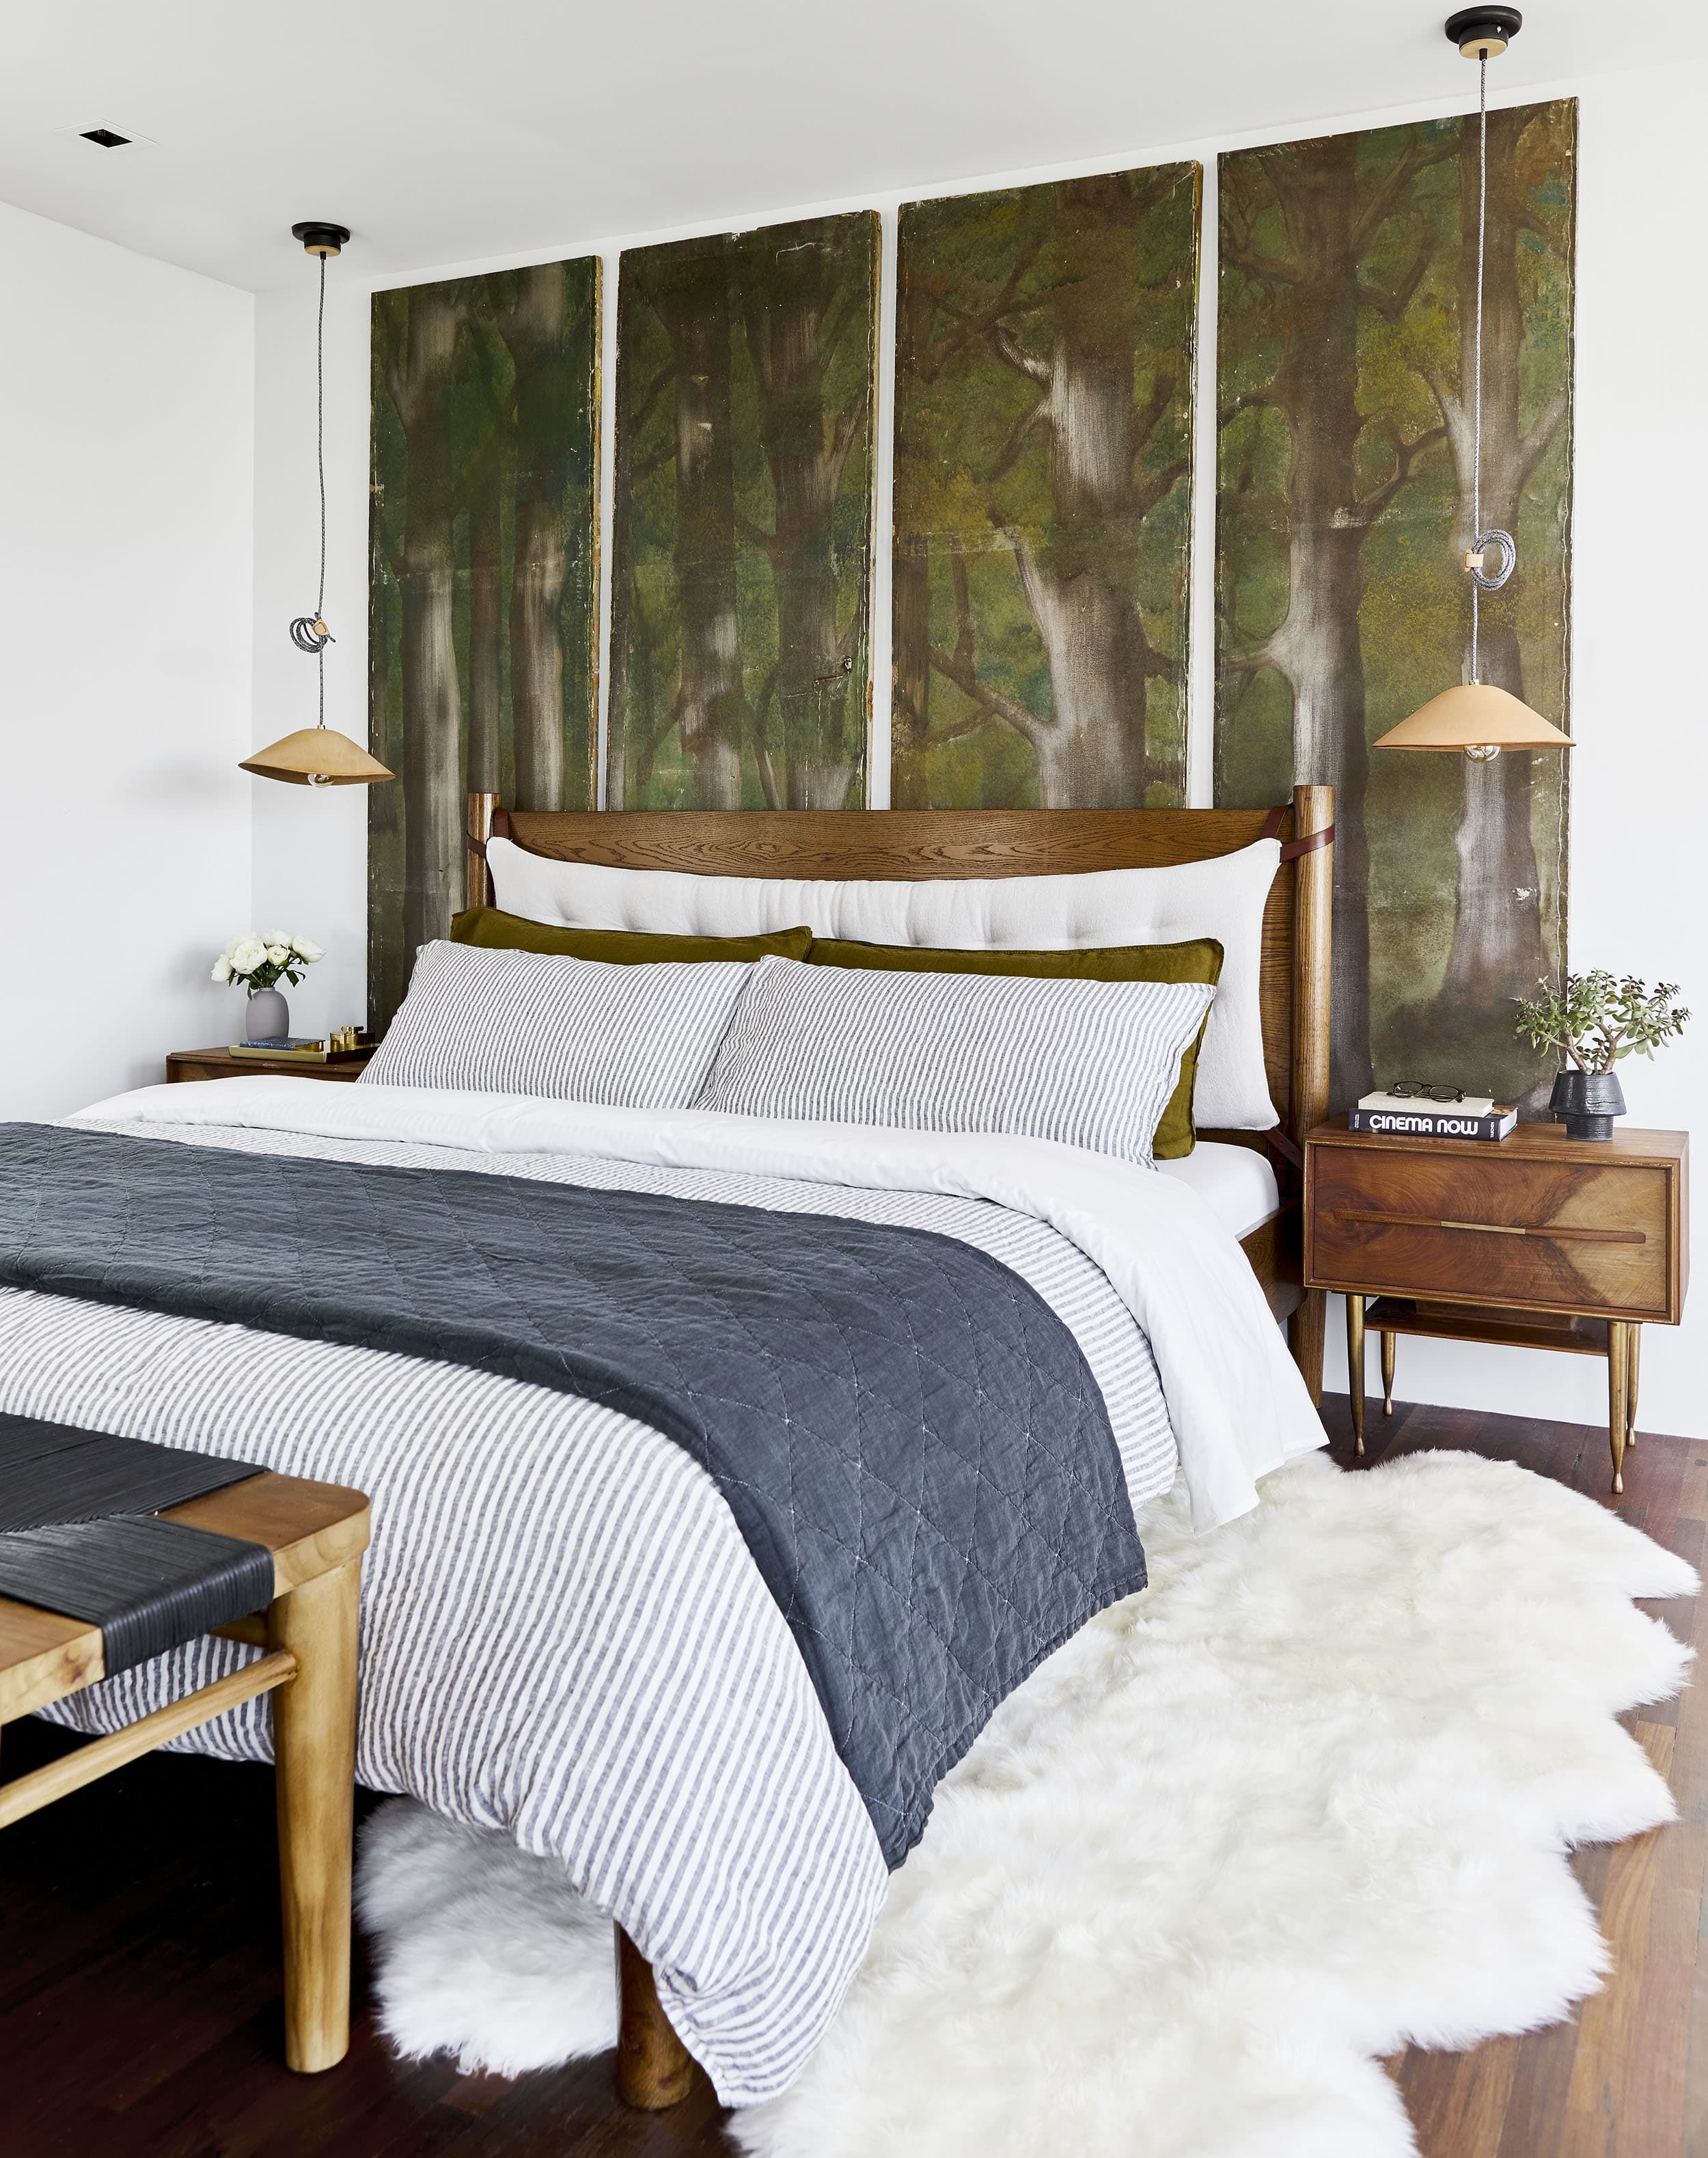 9 Steps to Get a High-Impact & Organic Bedroom (+ Brooklinen